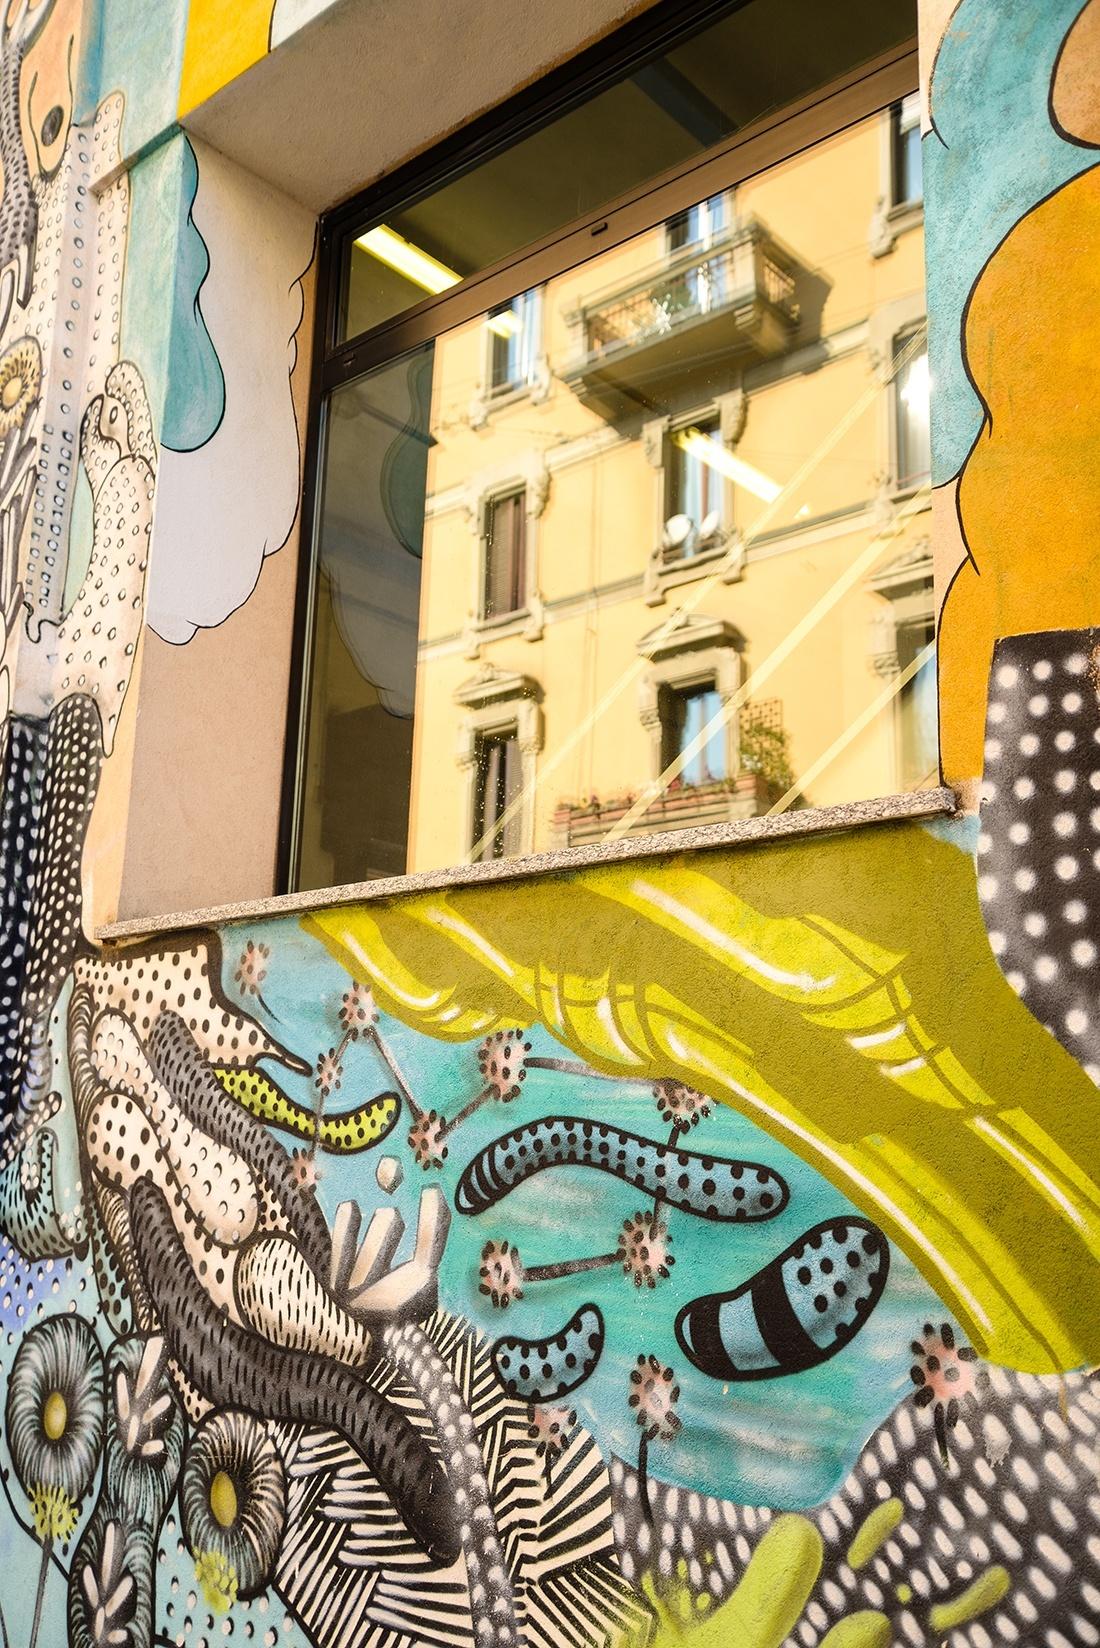 street-art , Isola, via Angelo della Pergola, Milan